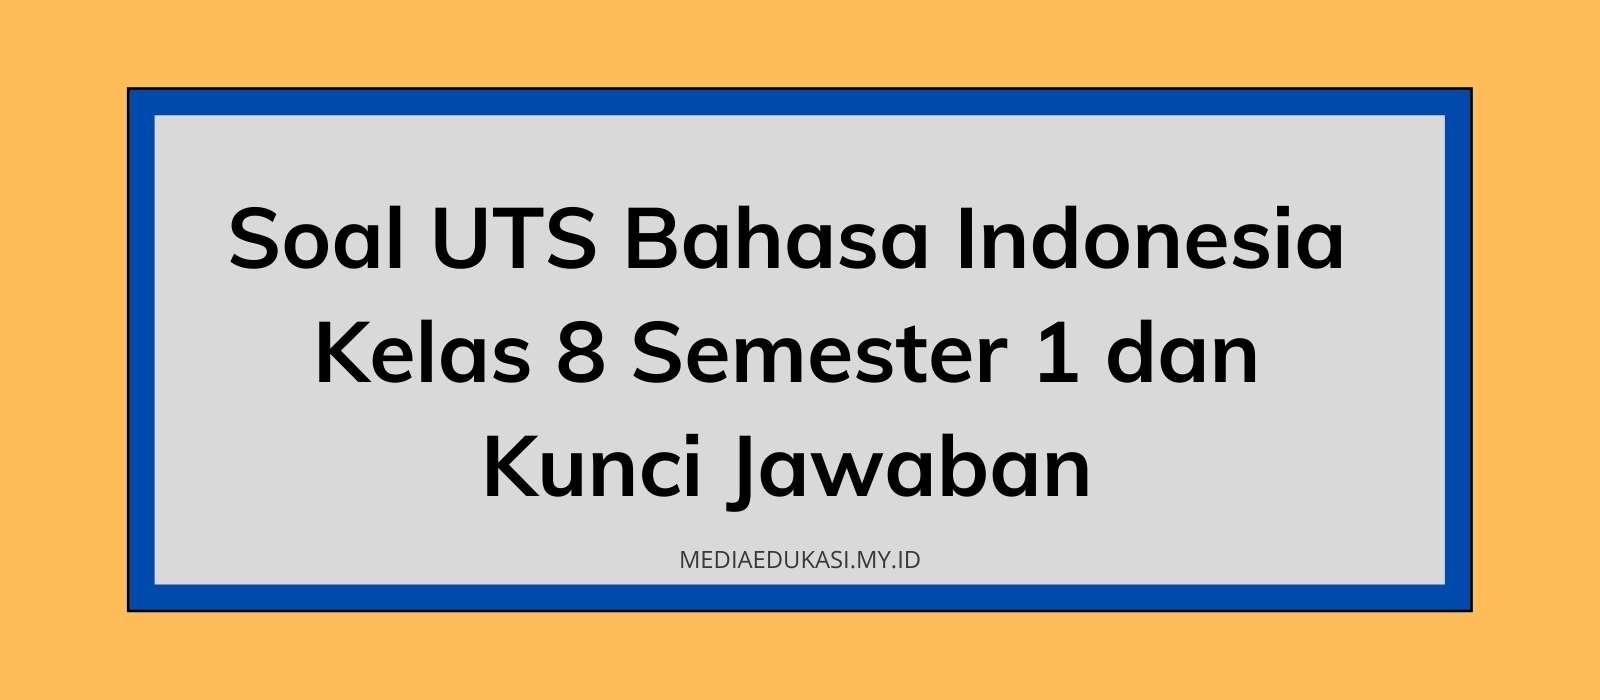 Soal PTS Bahasa Indonesia Kelas 8 Semester 1 dan Kunci Jawaban